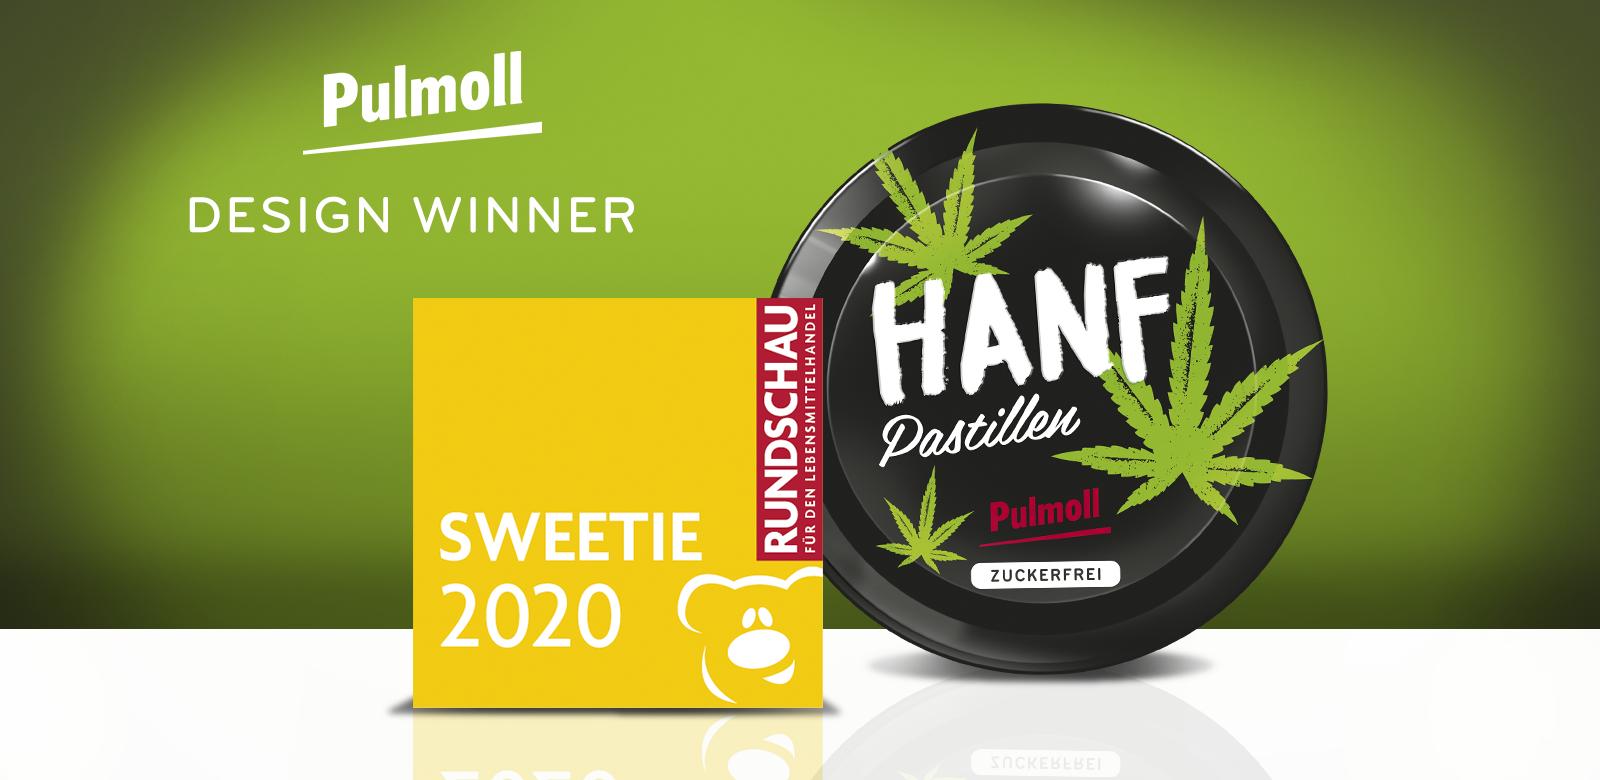 Design Winner Sweetie Award: Hanf